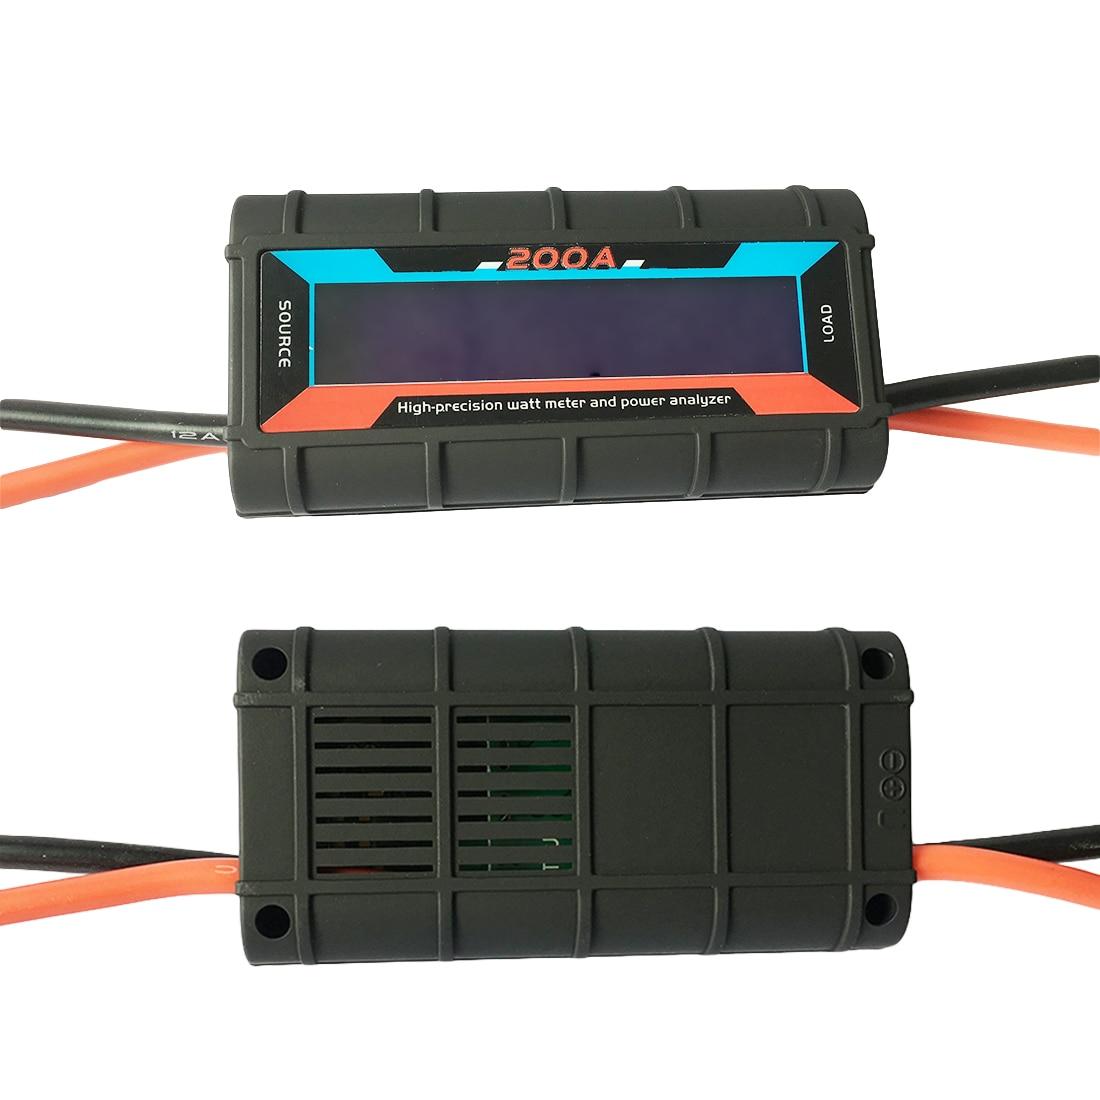 200A High Precision Power Meter 0-60V LCD Display Watt Meter Voltage Current Meter Aeromodelling Power Meter direct selling rw7 10 200a outdoor high voltage 10kv drop type fuse